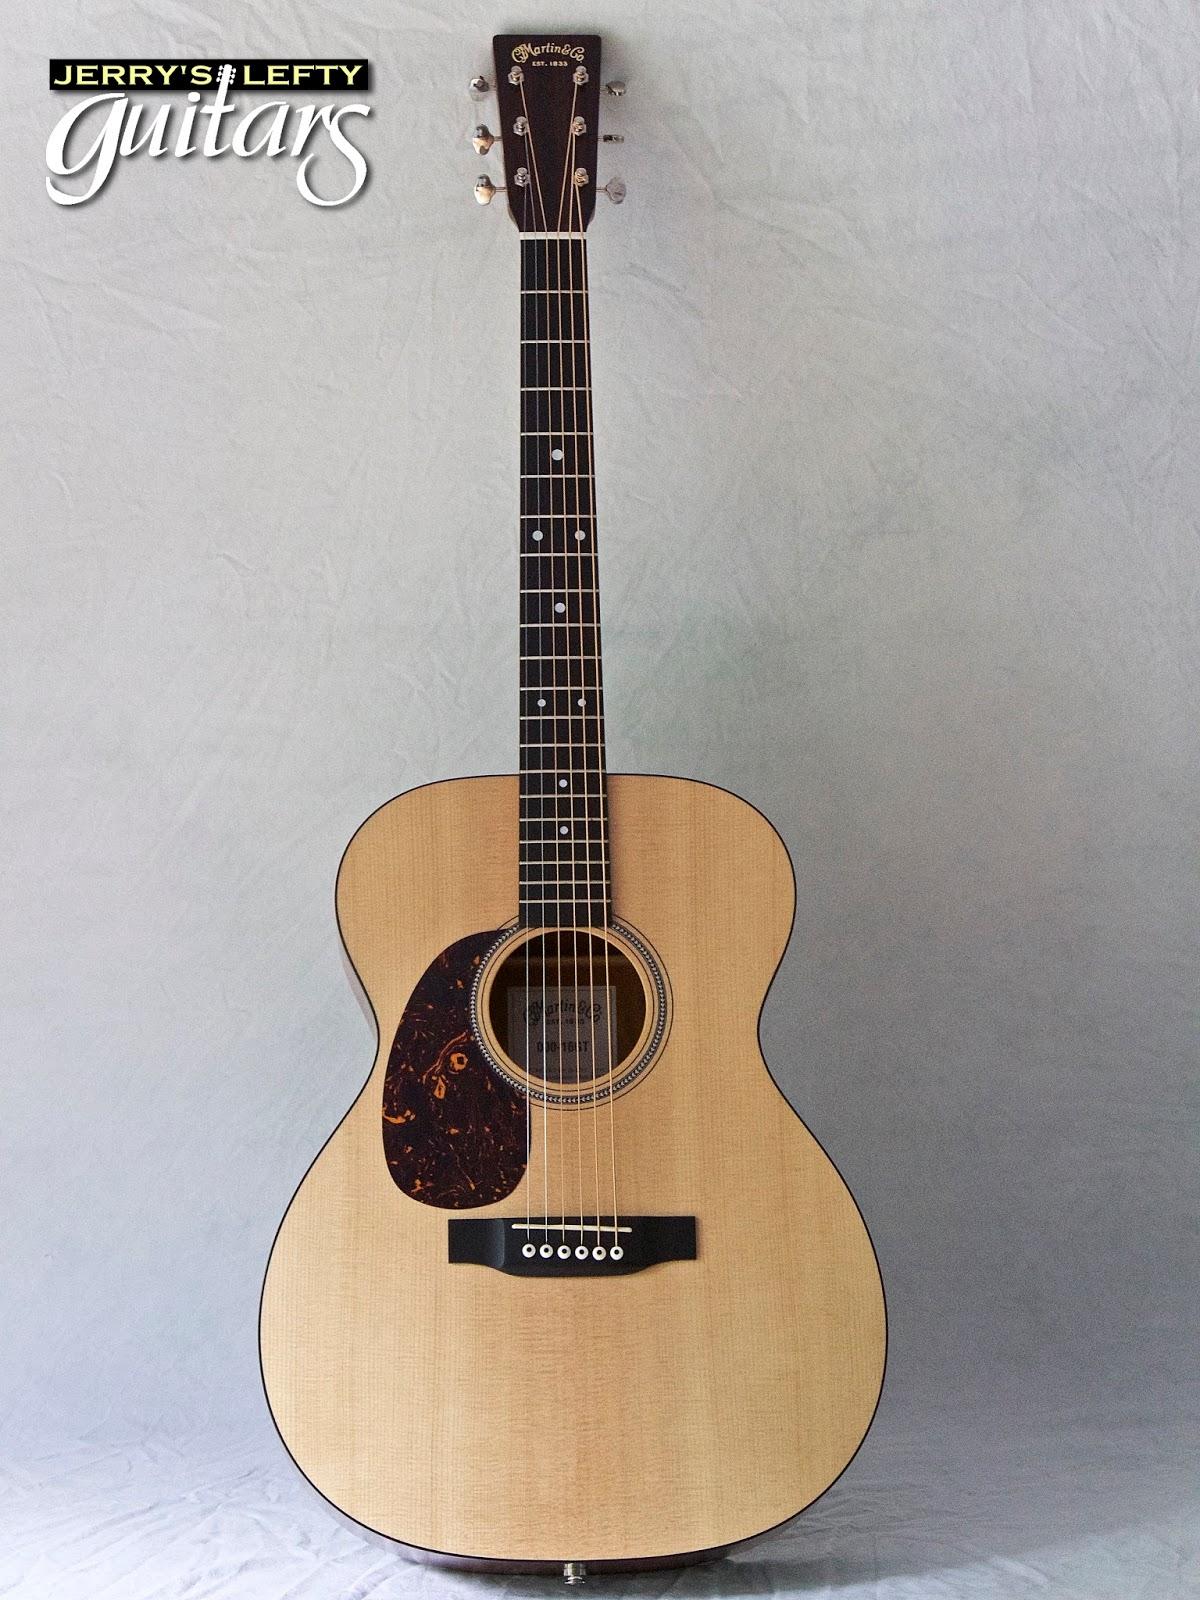 jerry 39 s lefty guitars newest guitar arrivals updated weekly martin 000 16gt used left handed. Black Bedroom Furniture Sets. Home Design Ideas